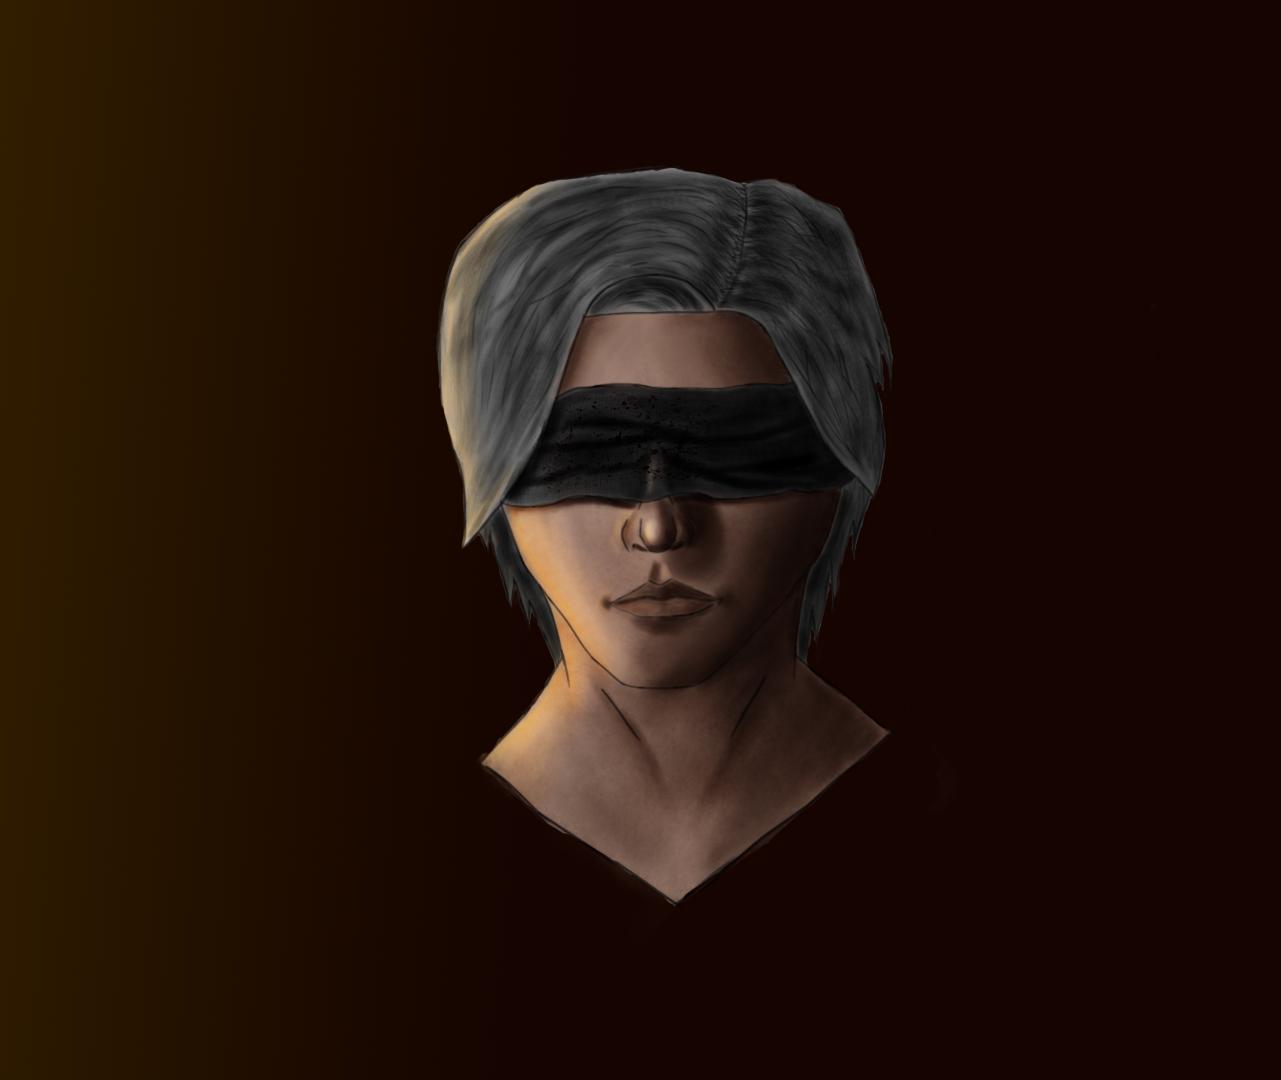 Blind boy